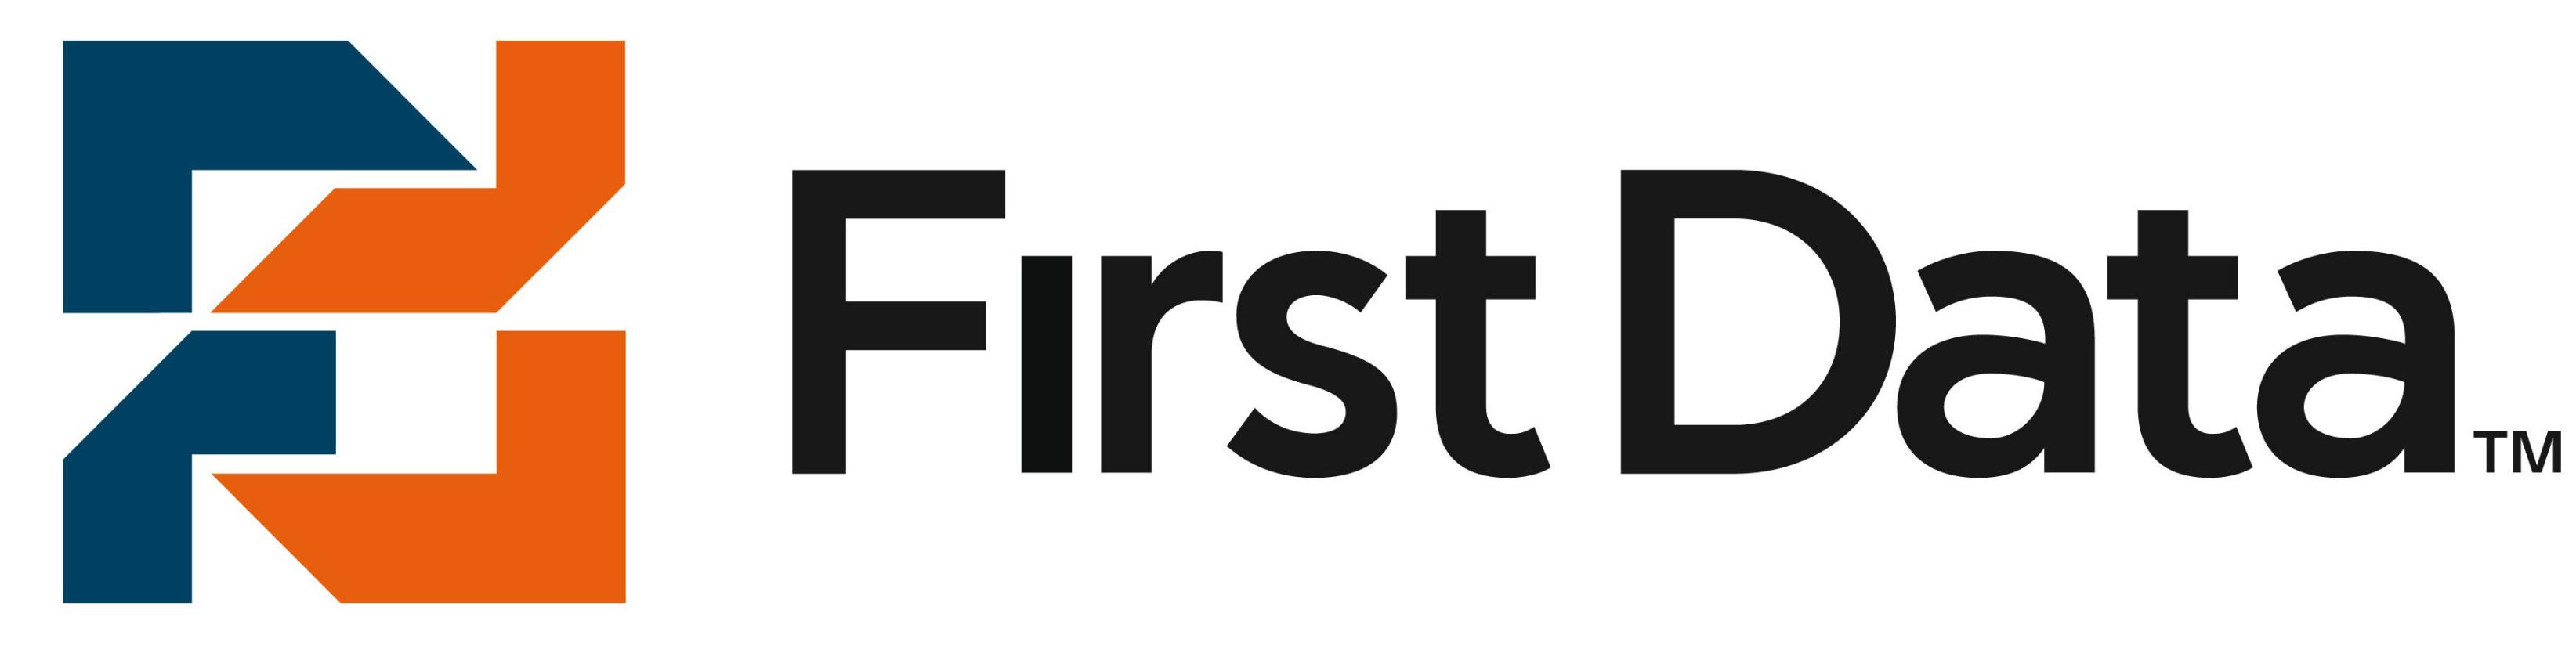 first-data-corporation